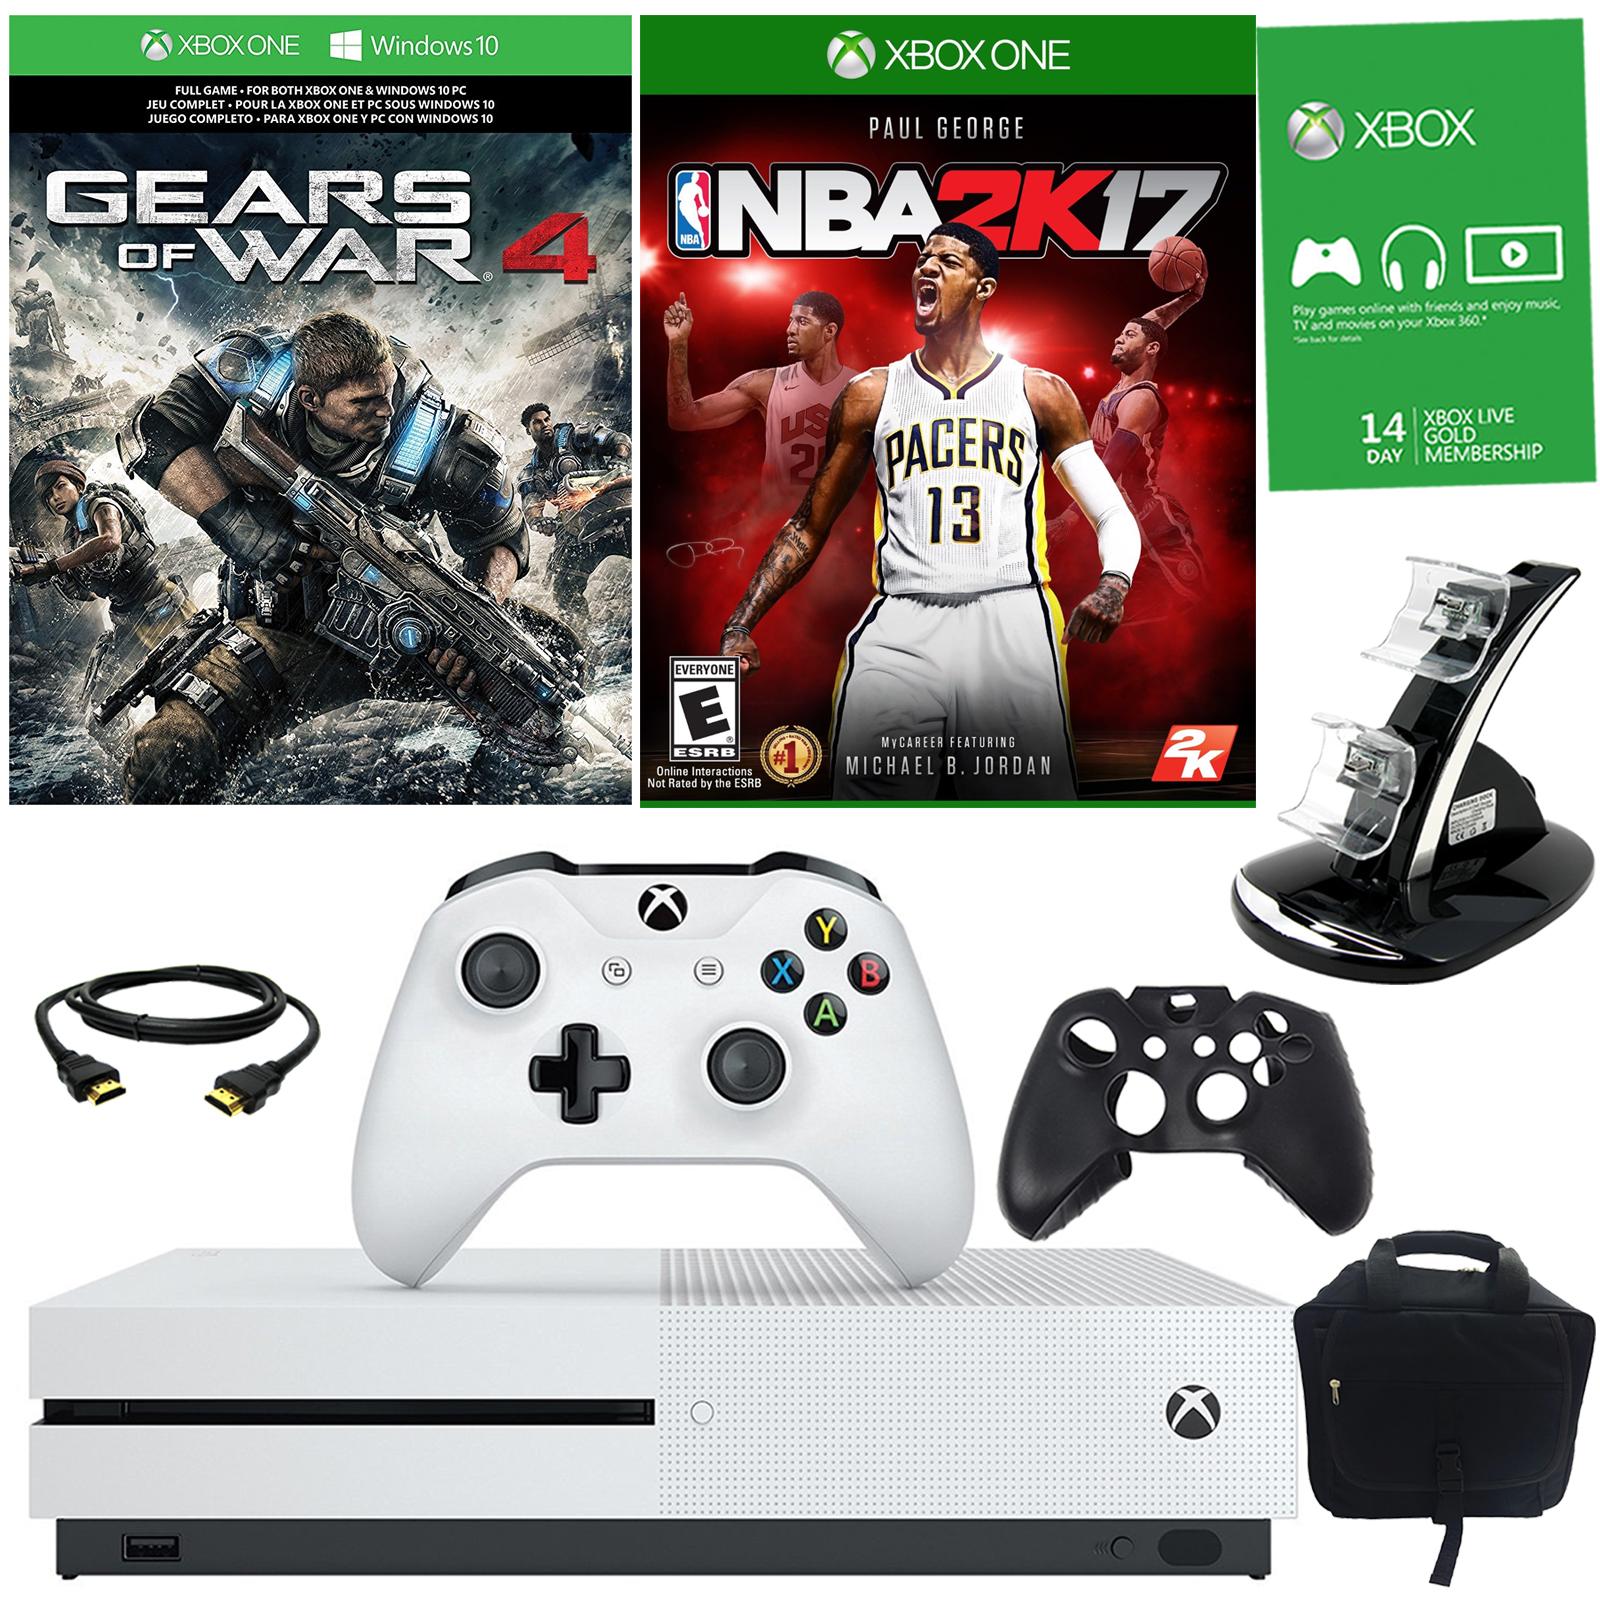 Microsoft Xbox One S 1TB Gears Of War 4 Bundle With NBA